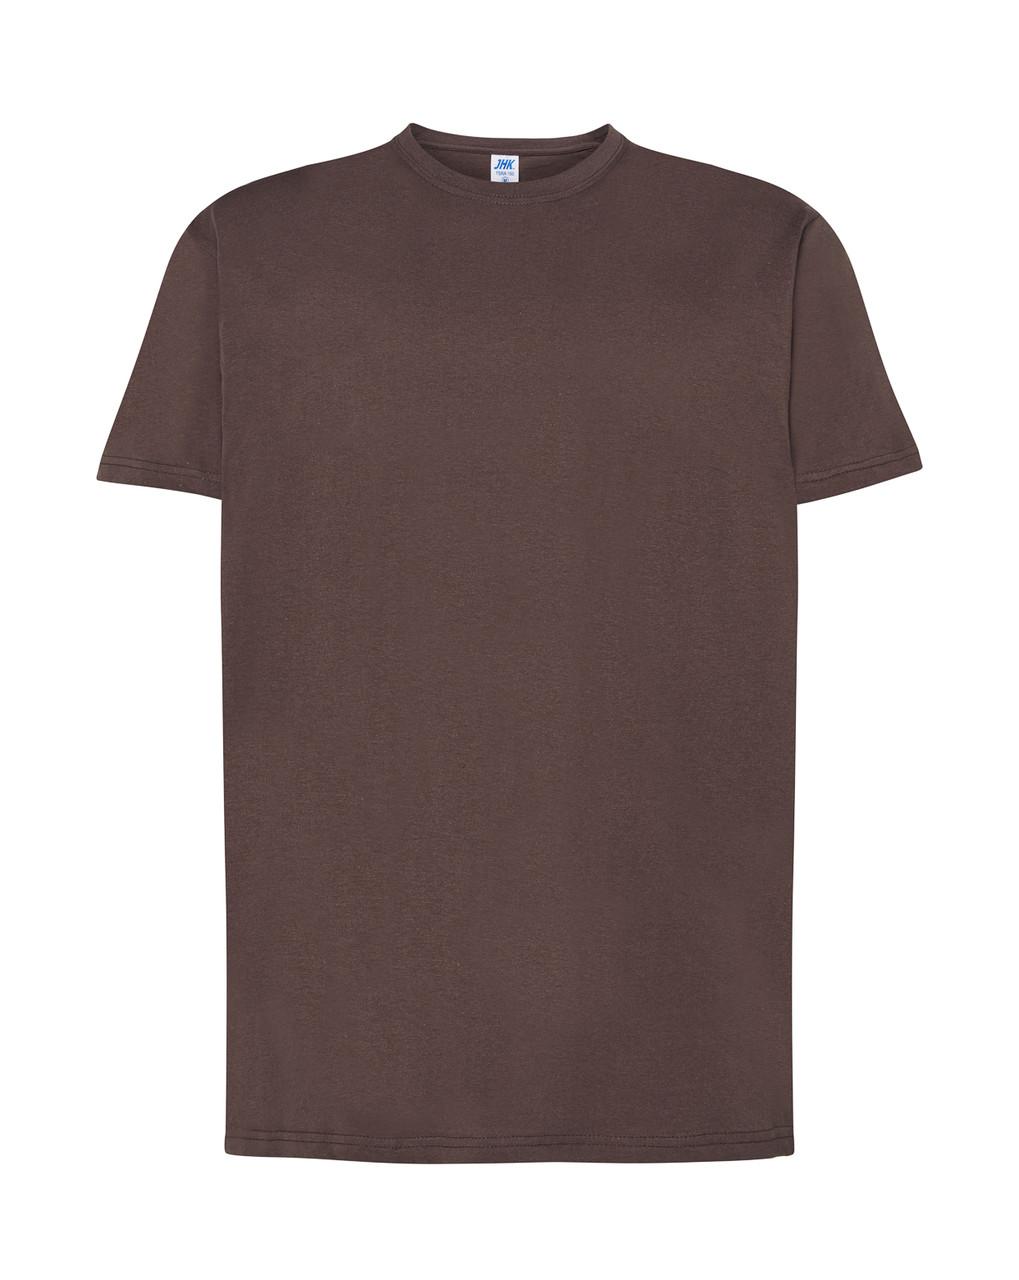 Мужская футболка JHK REGULAR PREMIUM T-SHIRT цвет серый (GF)